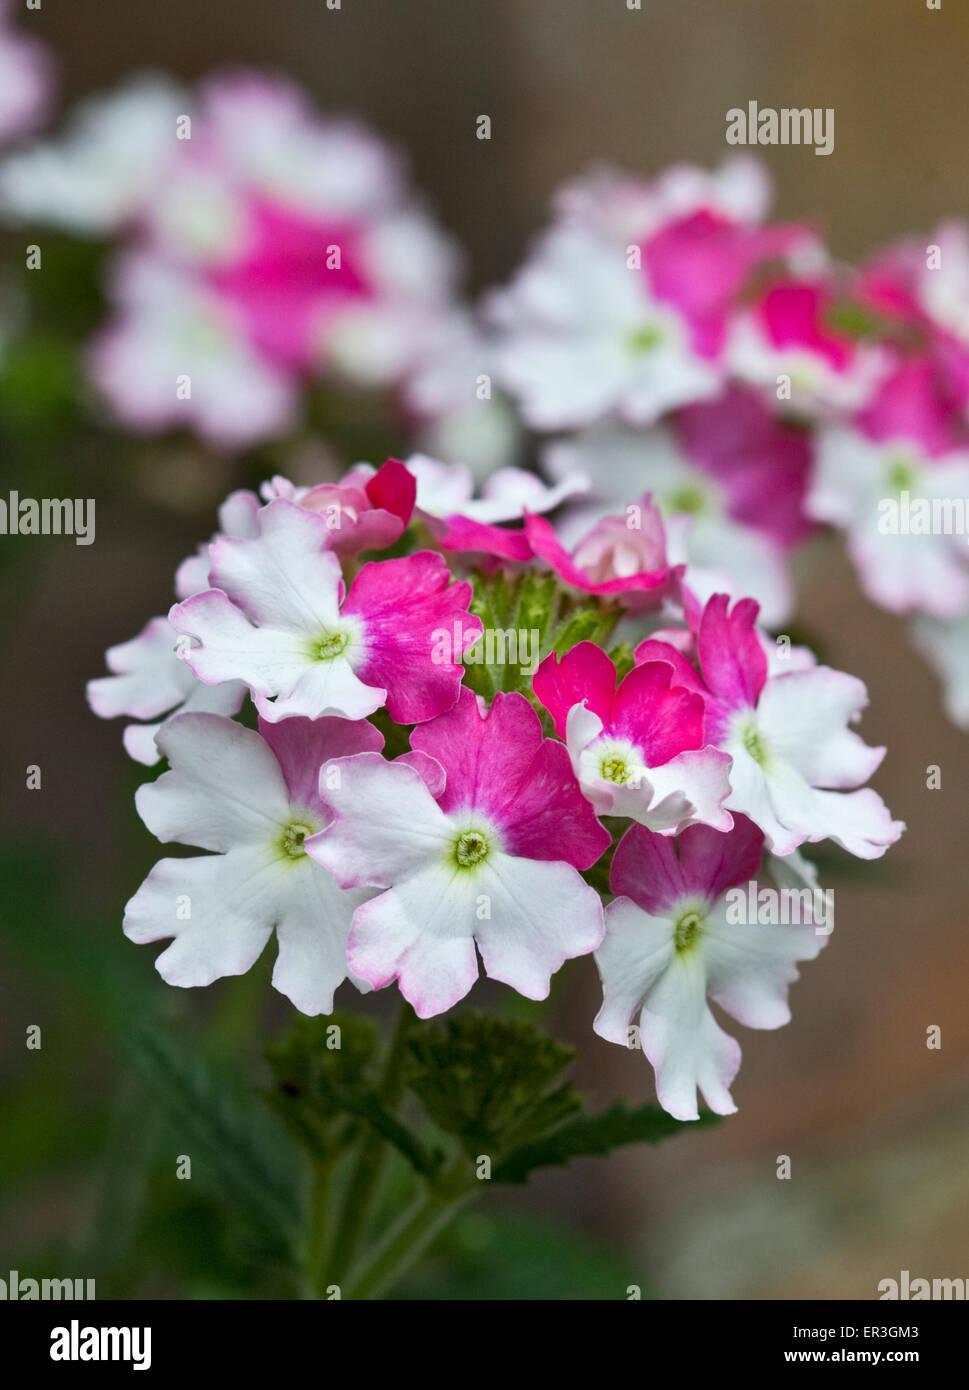 Verveine Rose Lanai Twist Photo Stock